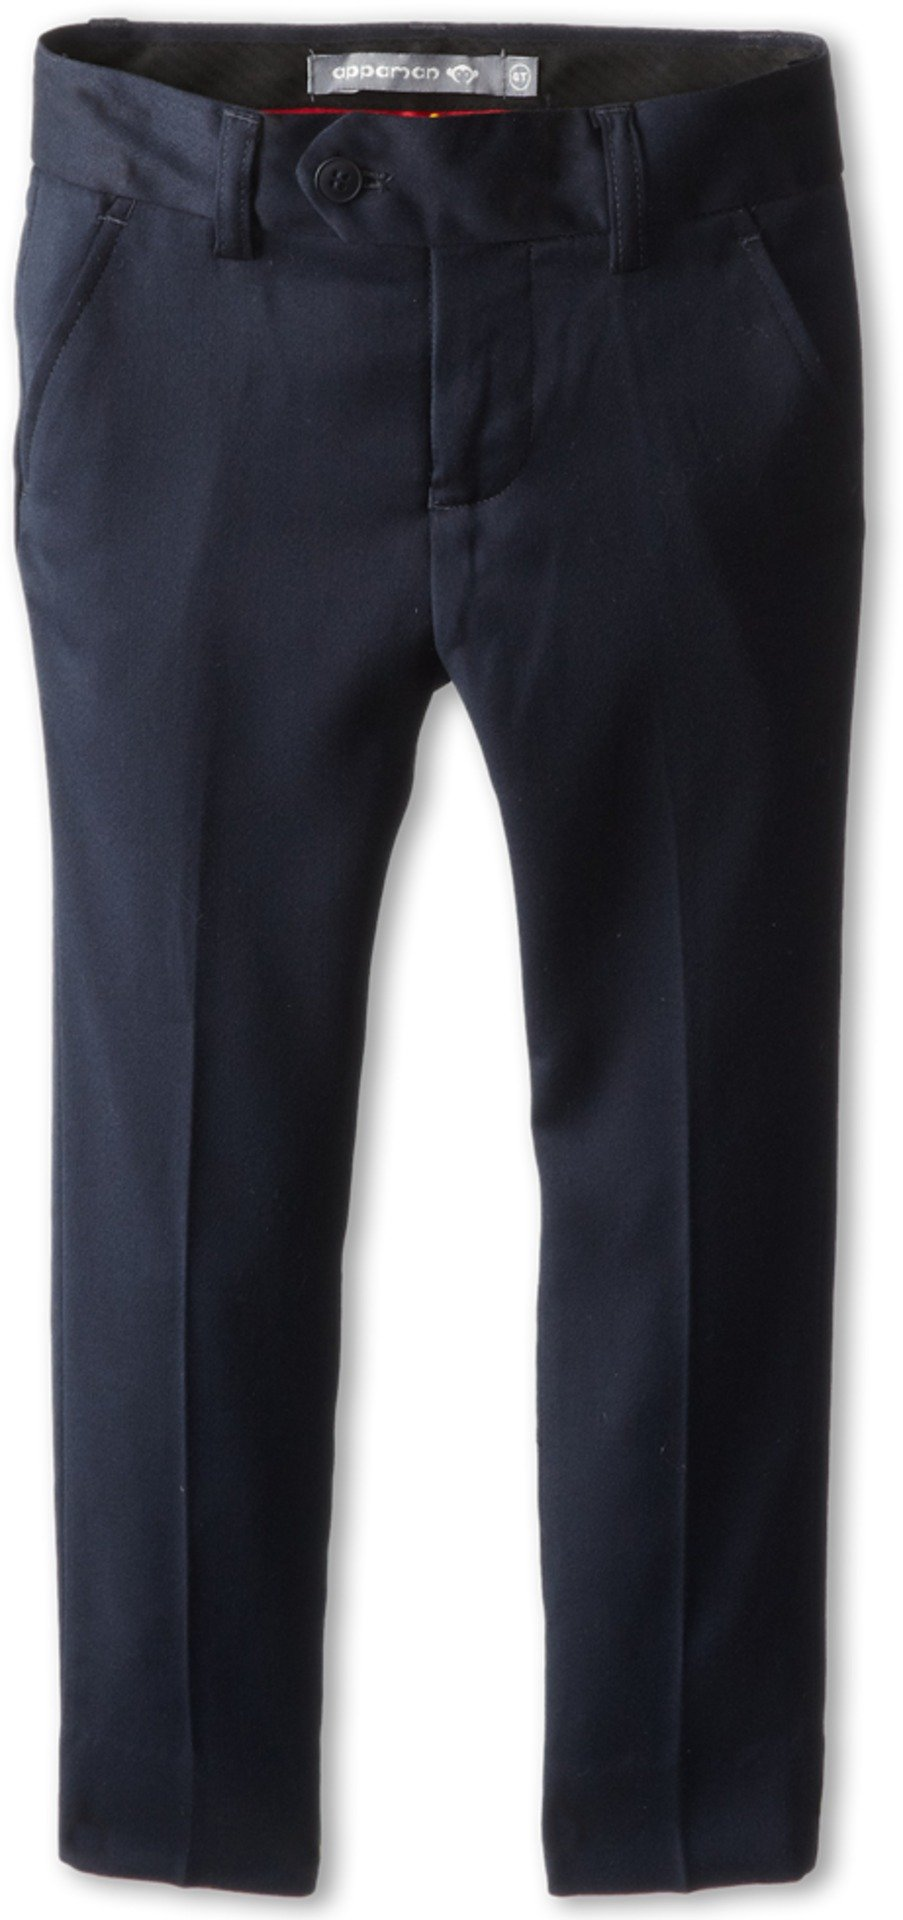 Appaman Kids Boy's Classic Mod Suit Pants (Toddler/Little Kids/Big Kids) Navy Blue Pants 8 Big Kids